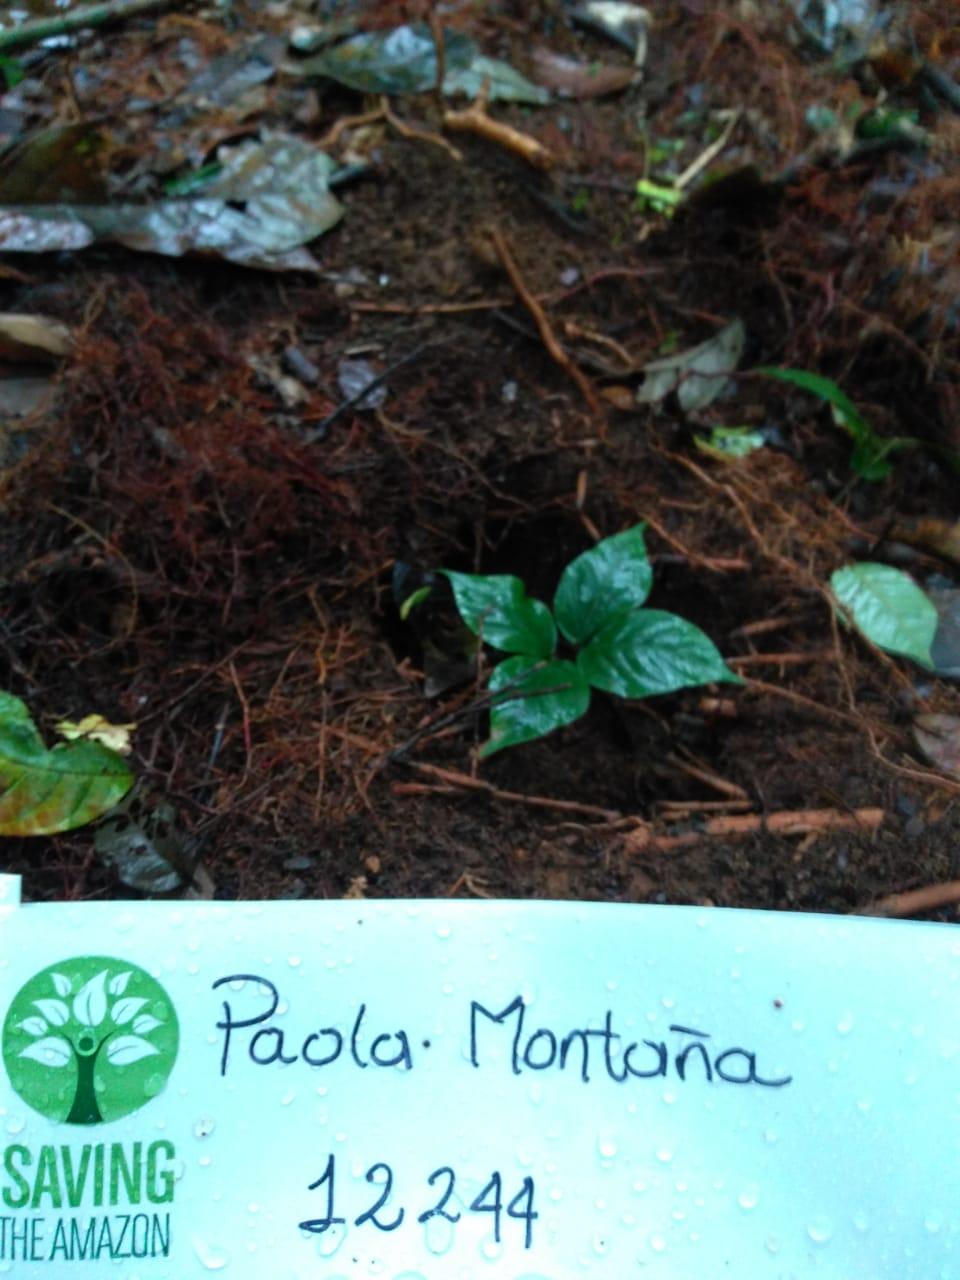 Paola Montanha